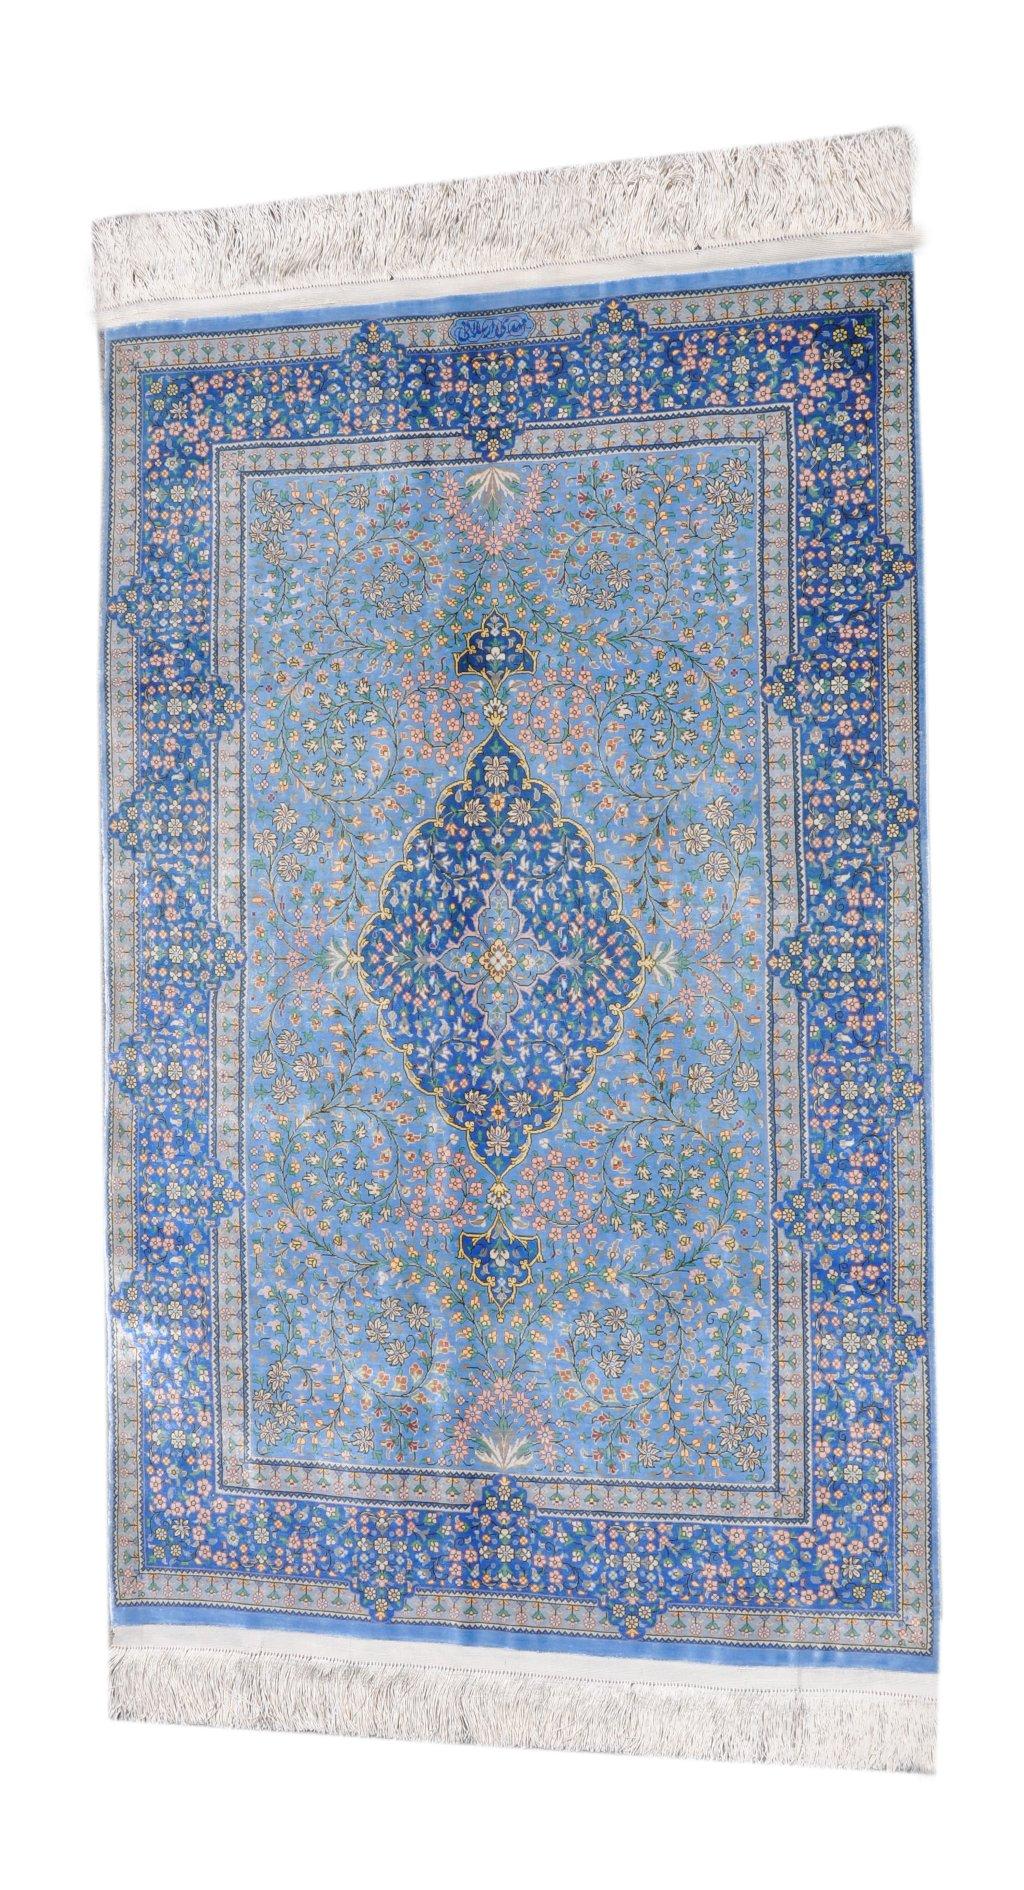 Arsalani Qom Silk Zarcharak Arsalani Luxury And Modern Rugs